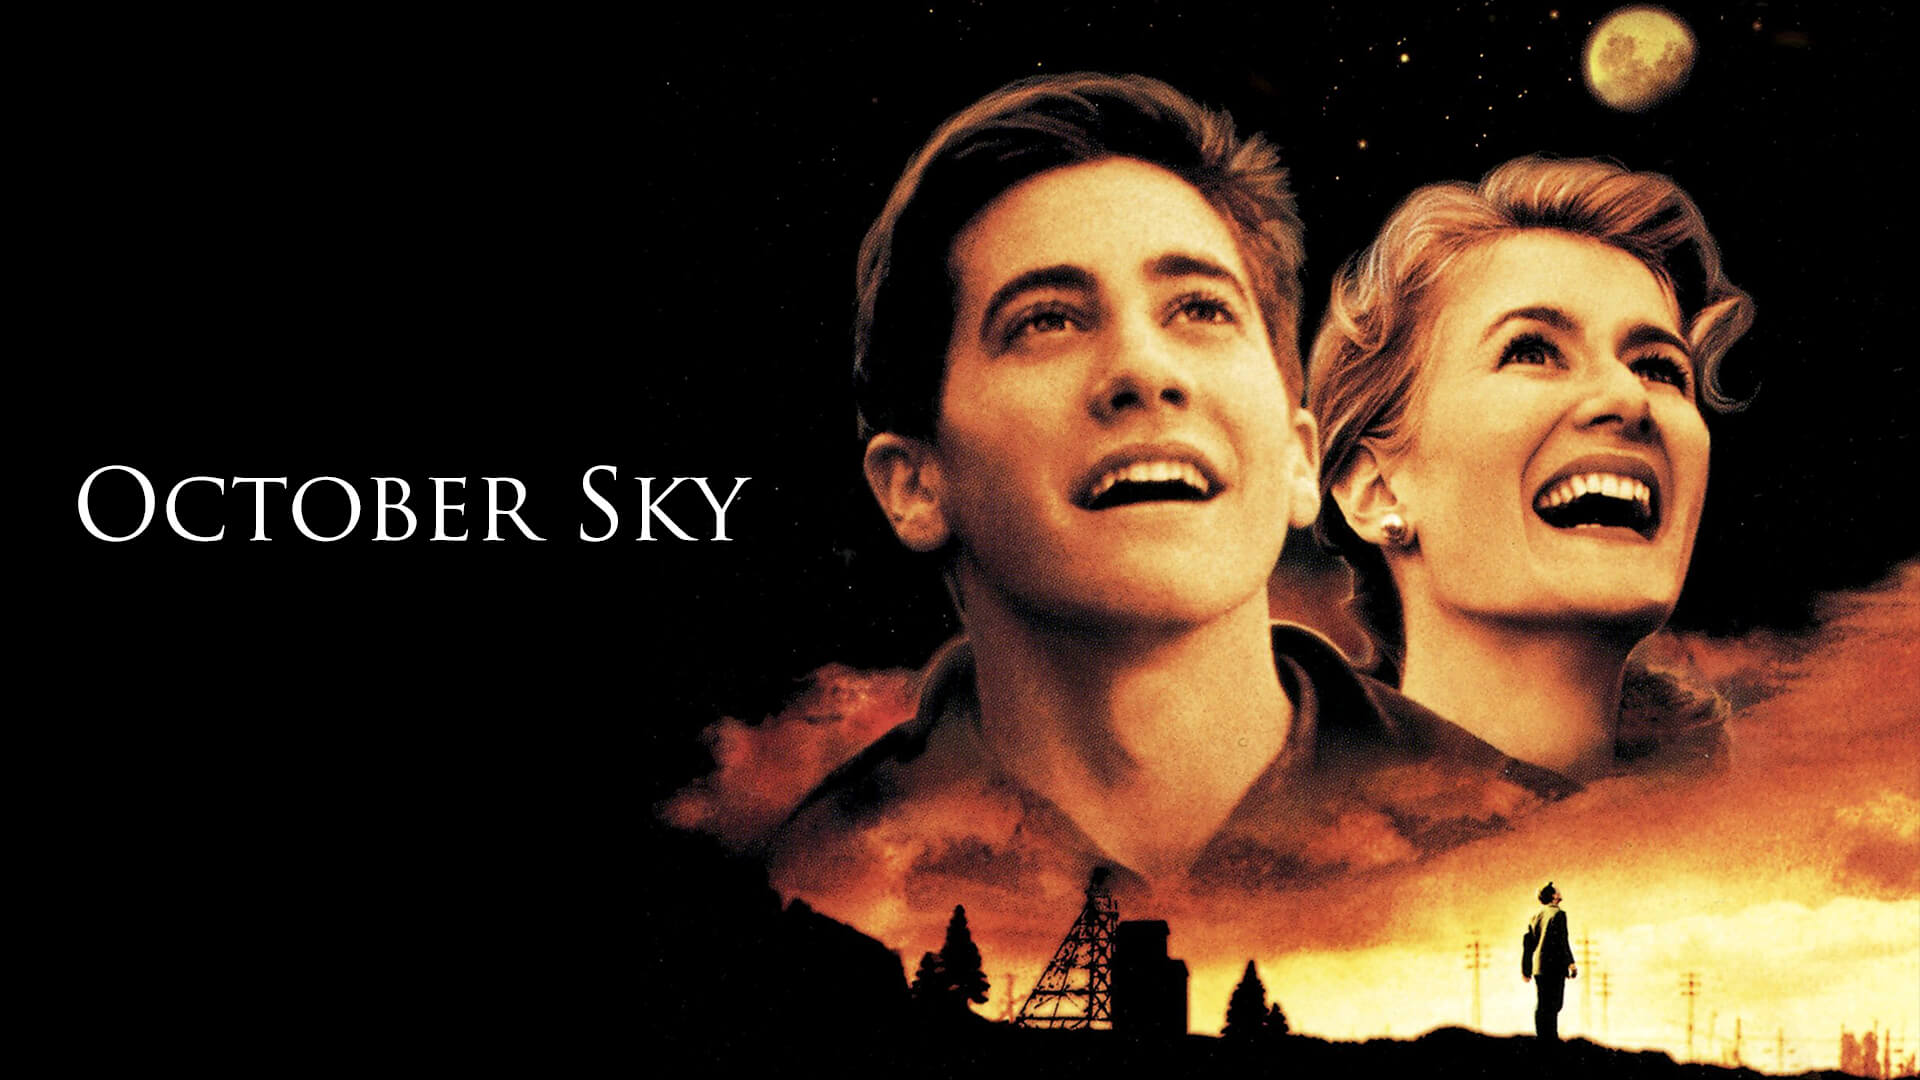 Wednesday Movie Matinee - October Sky